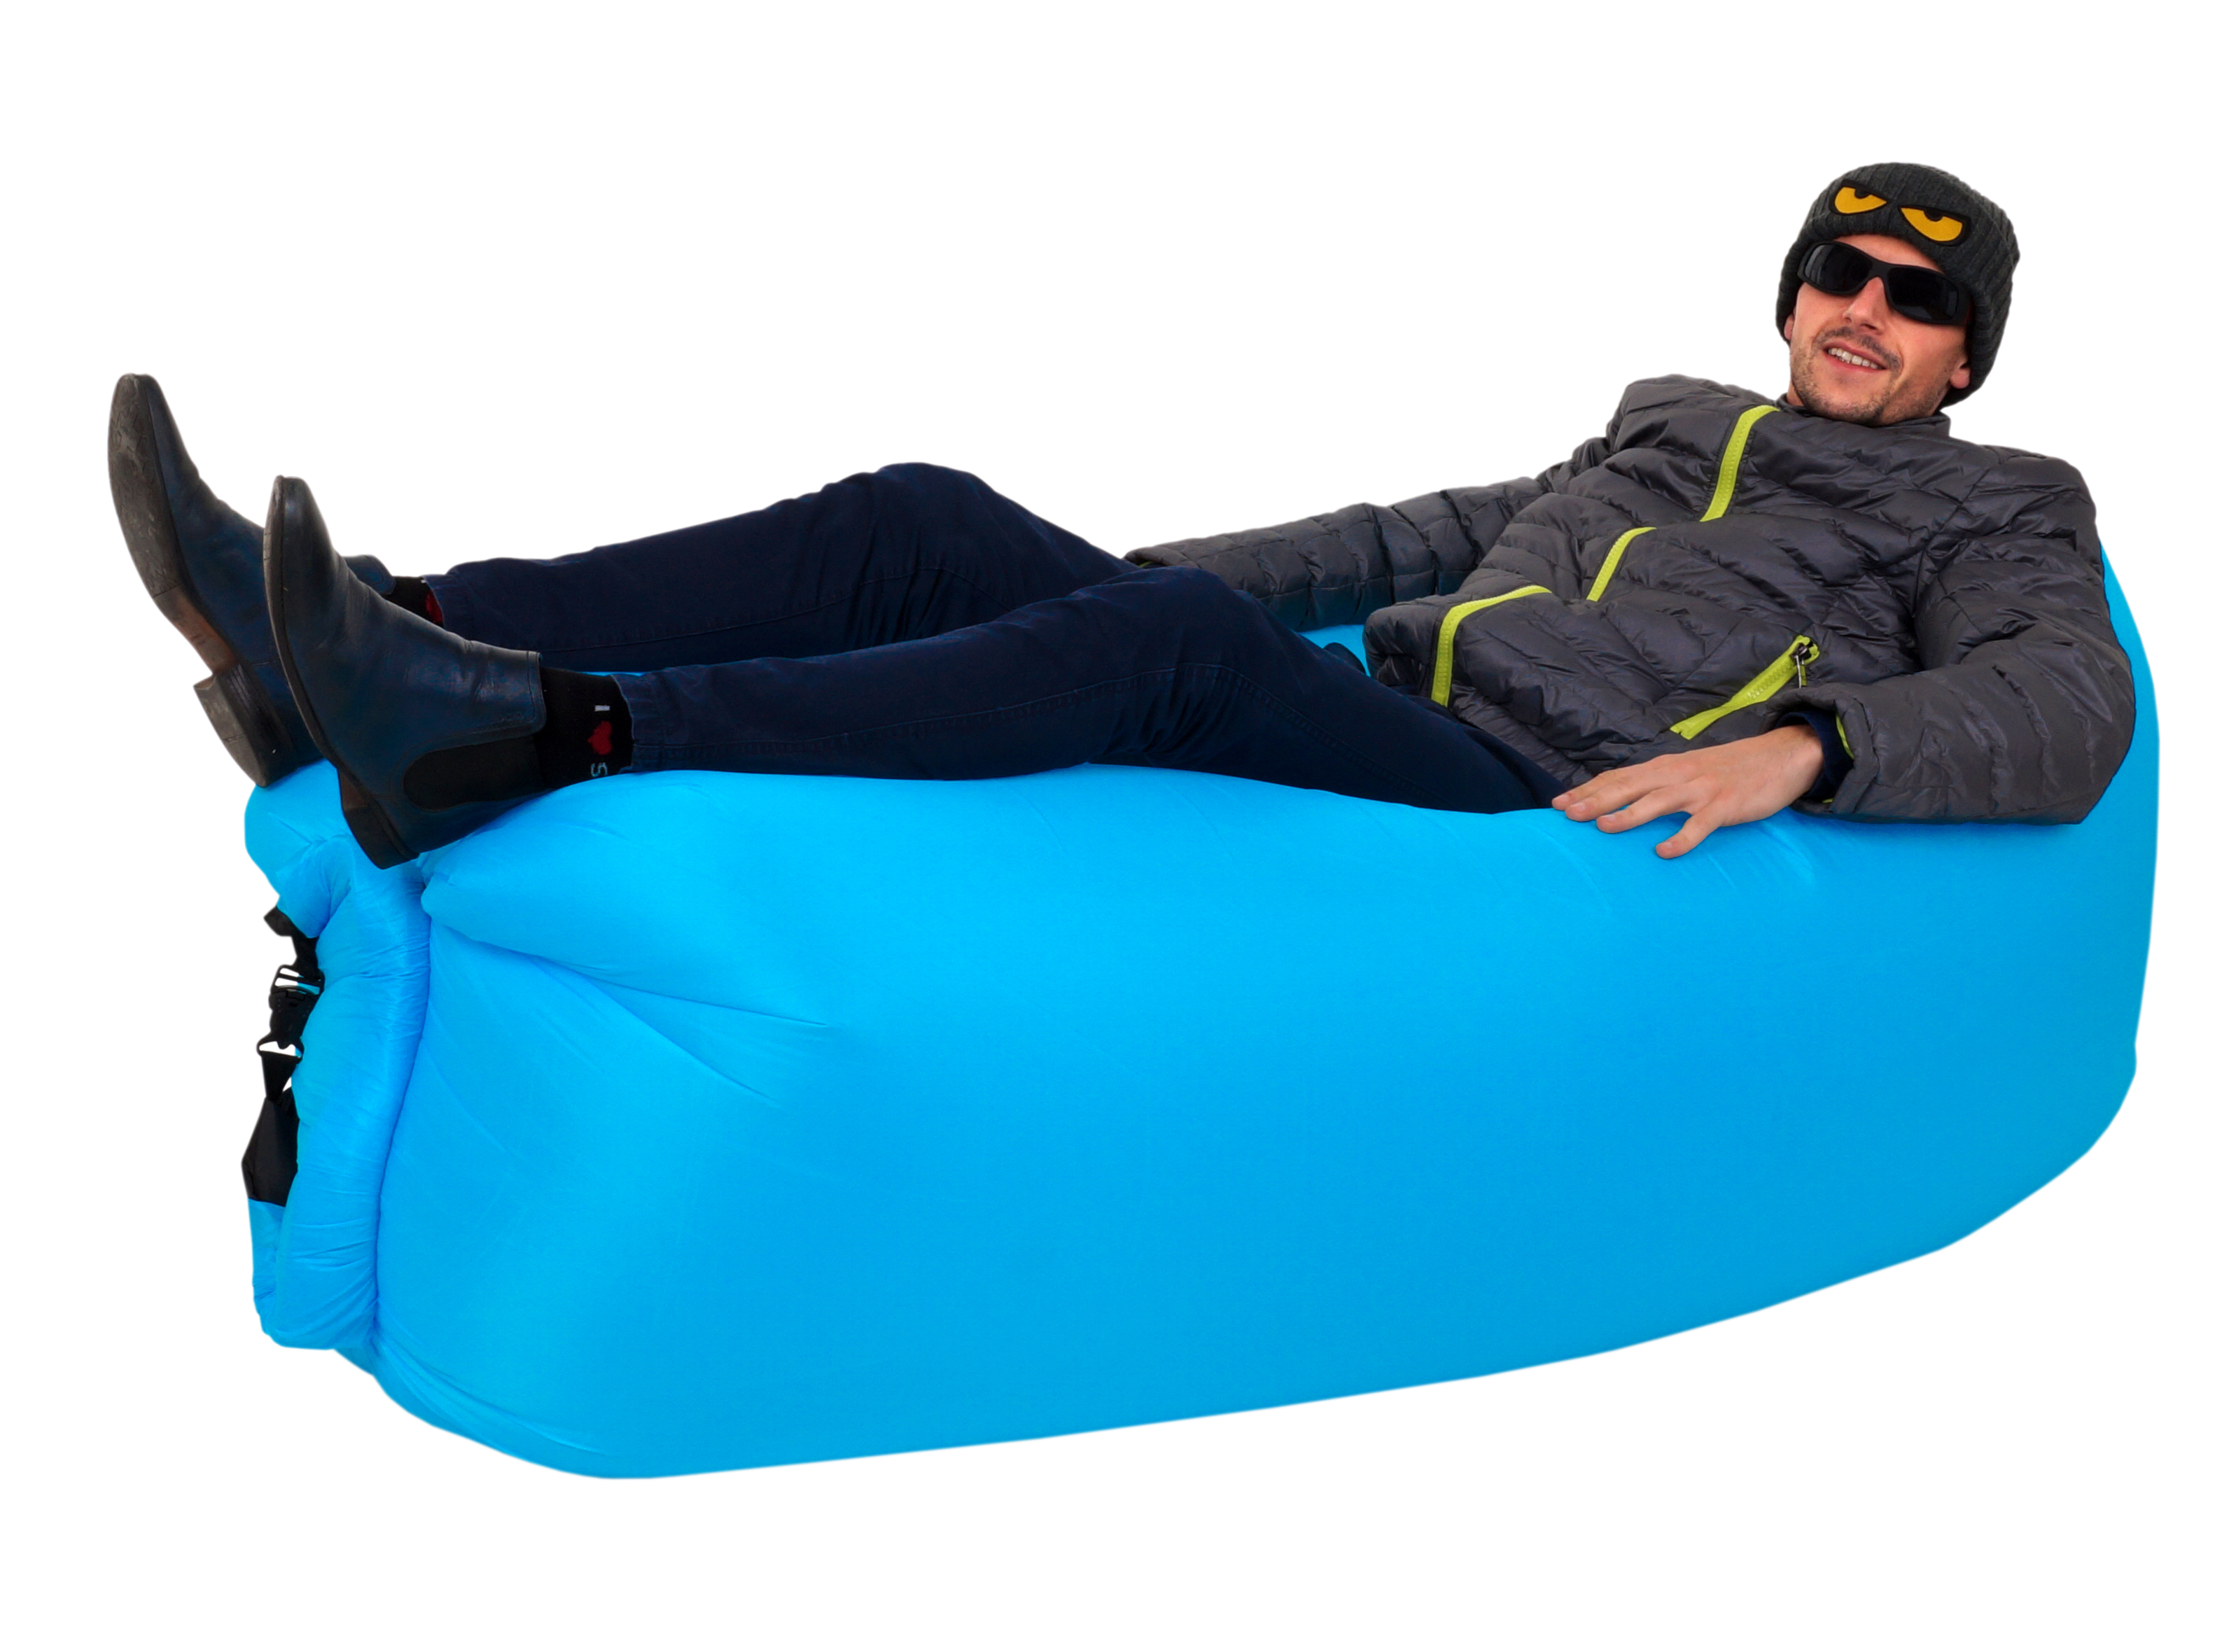 AirBag, vzduchový sedací a lehací vak